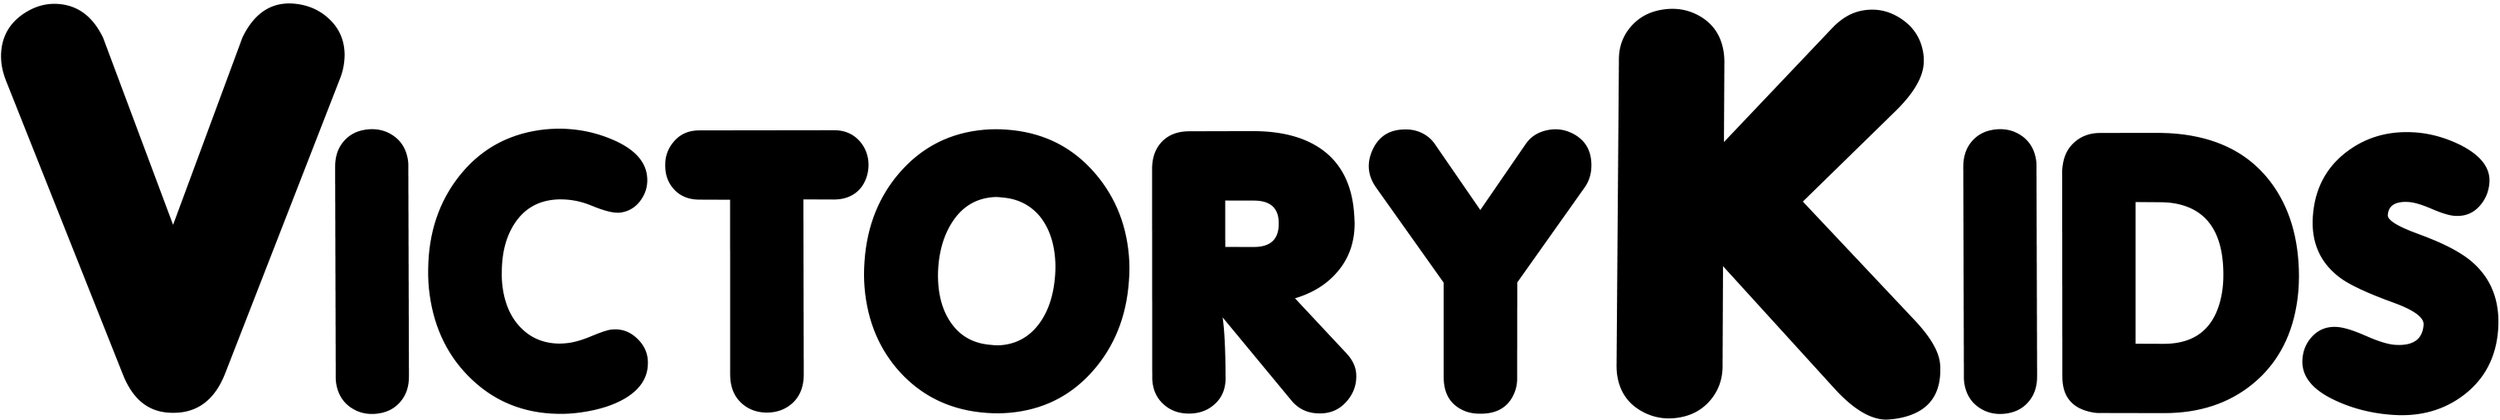 VictoryKIDS - porkys.jpg